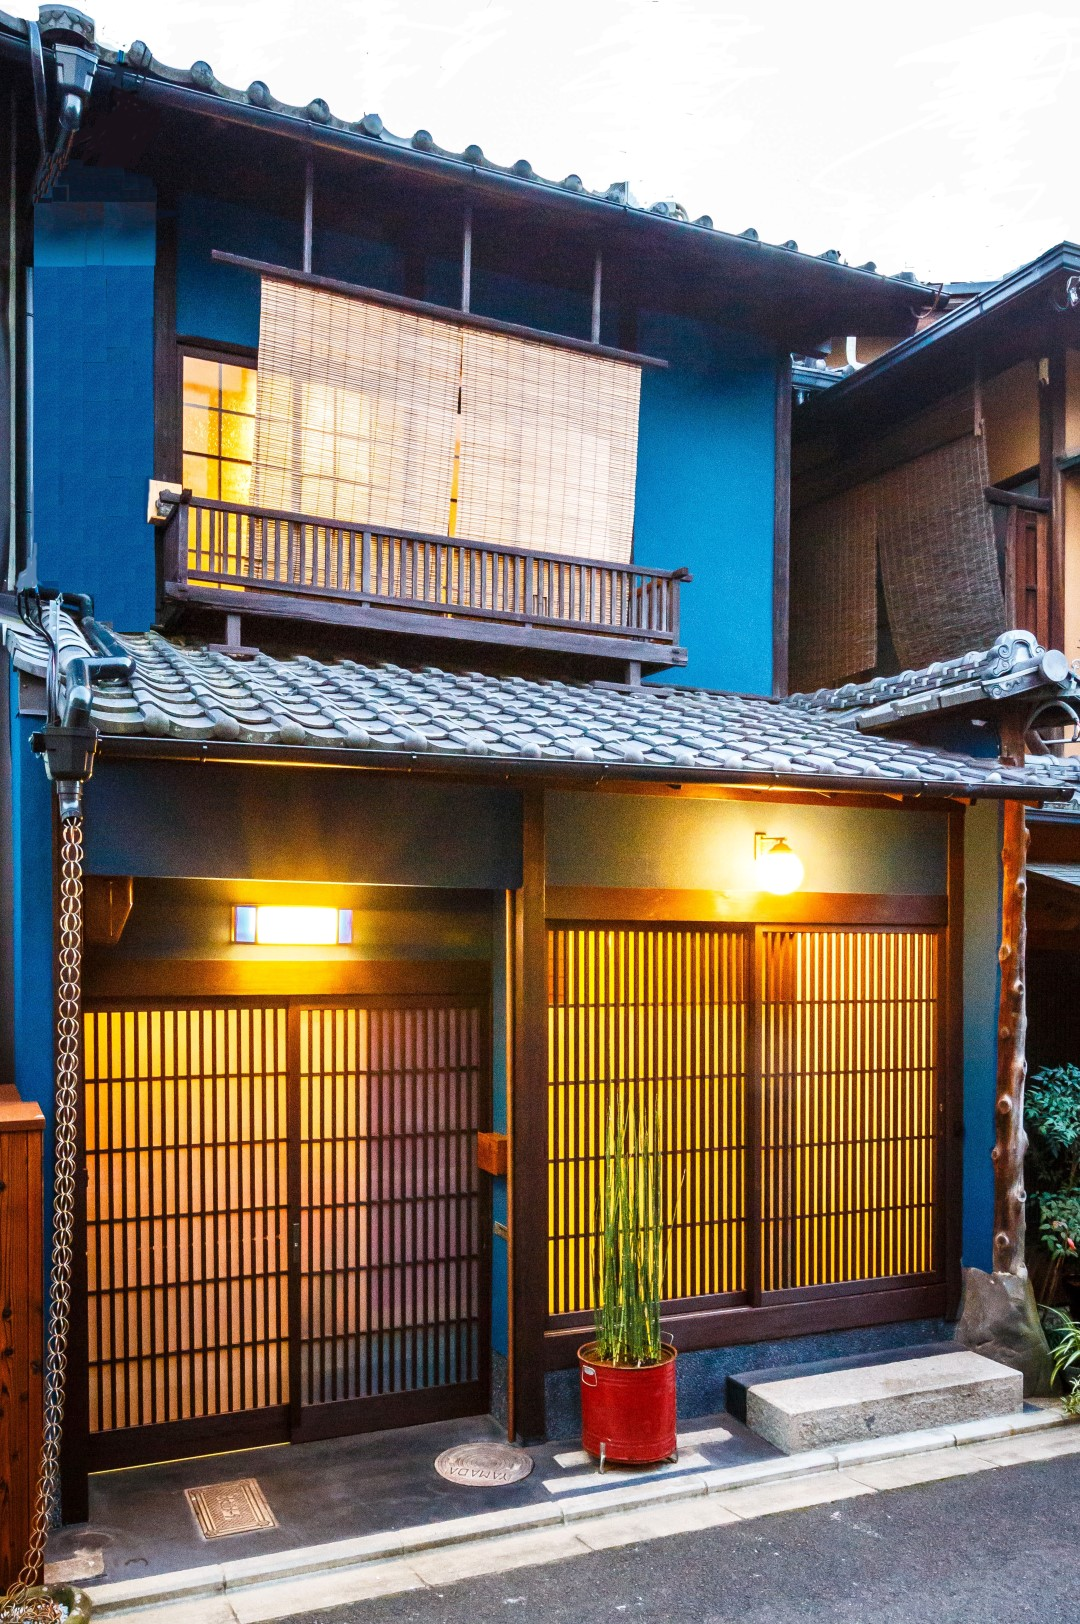 Exterior of Indigo House in Gion